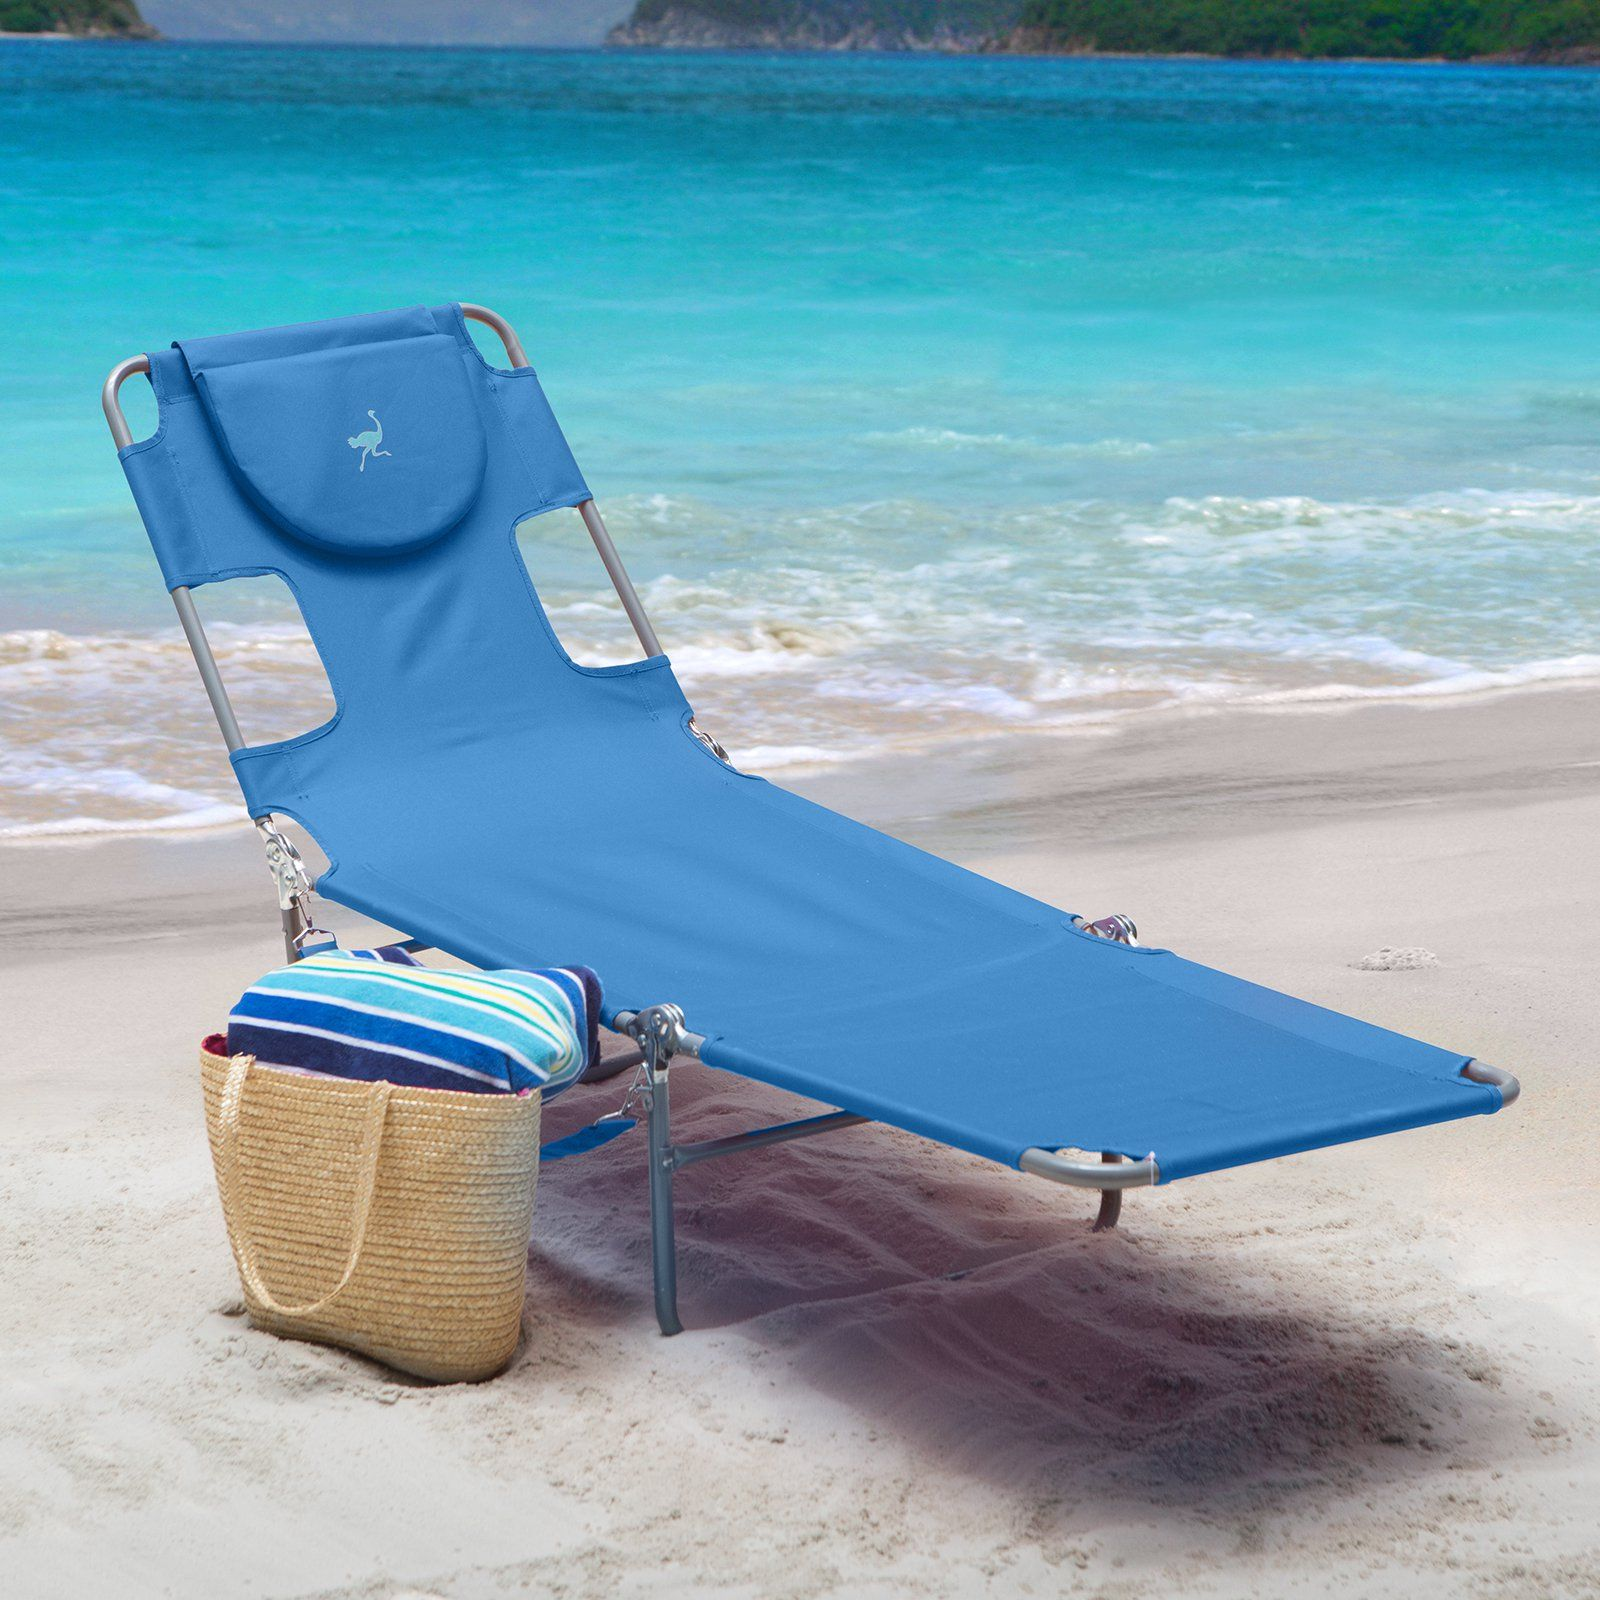 Charmant Outdoor Beach Chair: Ostrich Folding Lounge Chair   MP2 FOLDING CHAISE